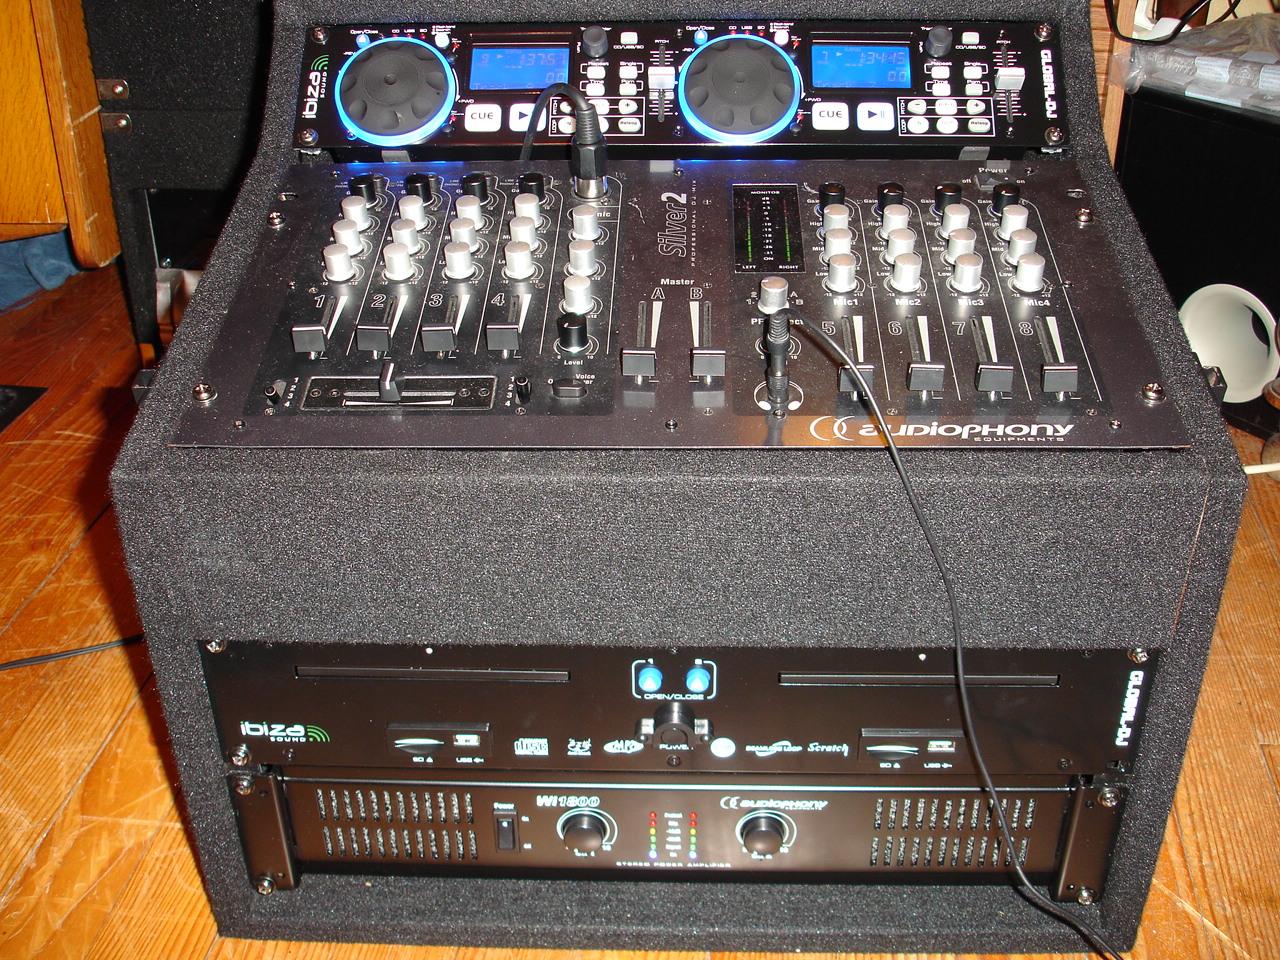 Location de mat riel de sonorisation enceintes micro - Branchement enceinte amplifiee table mixage ...